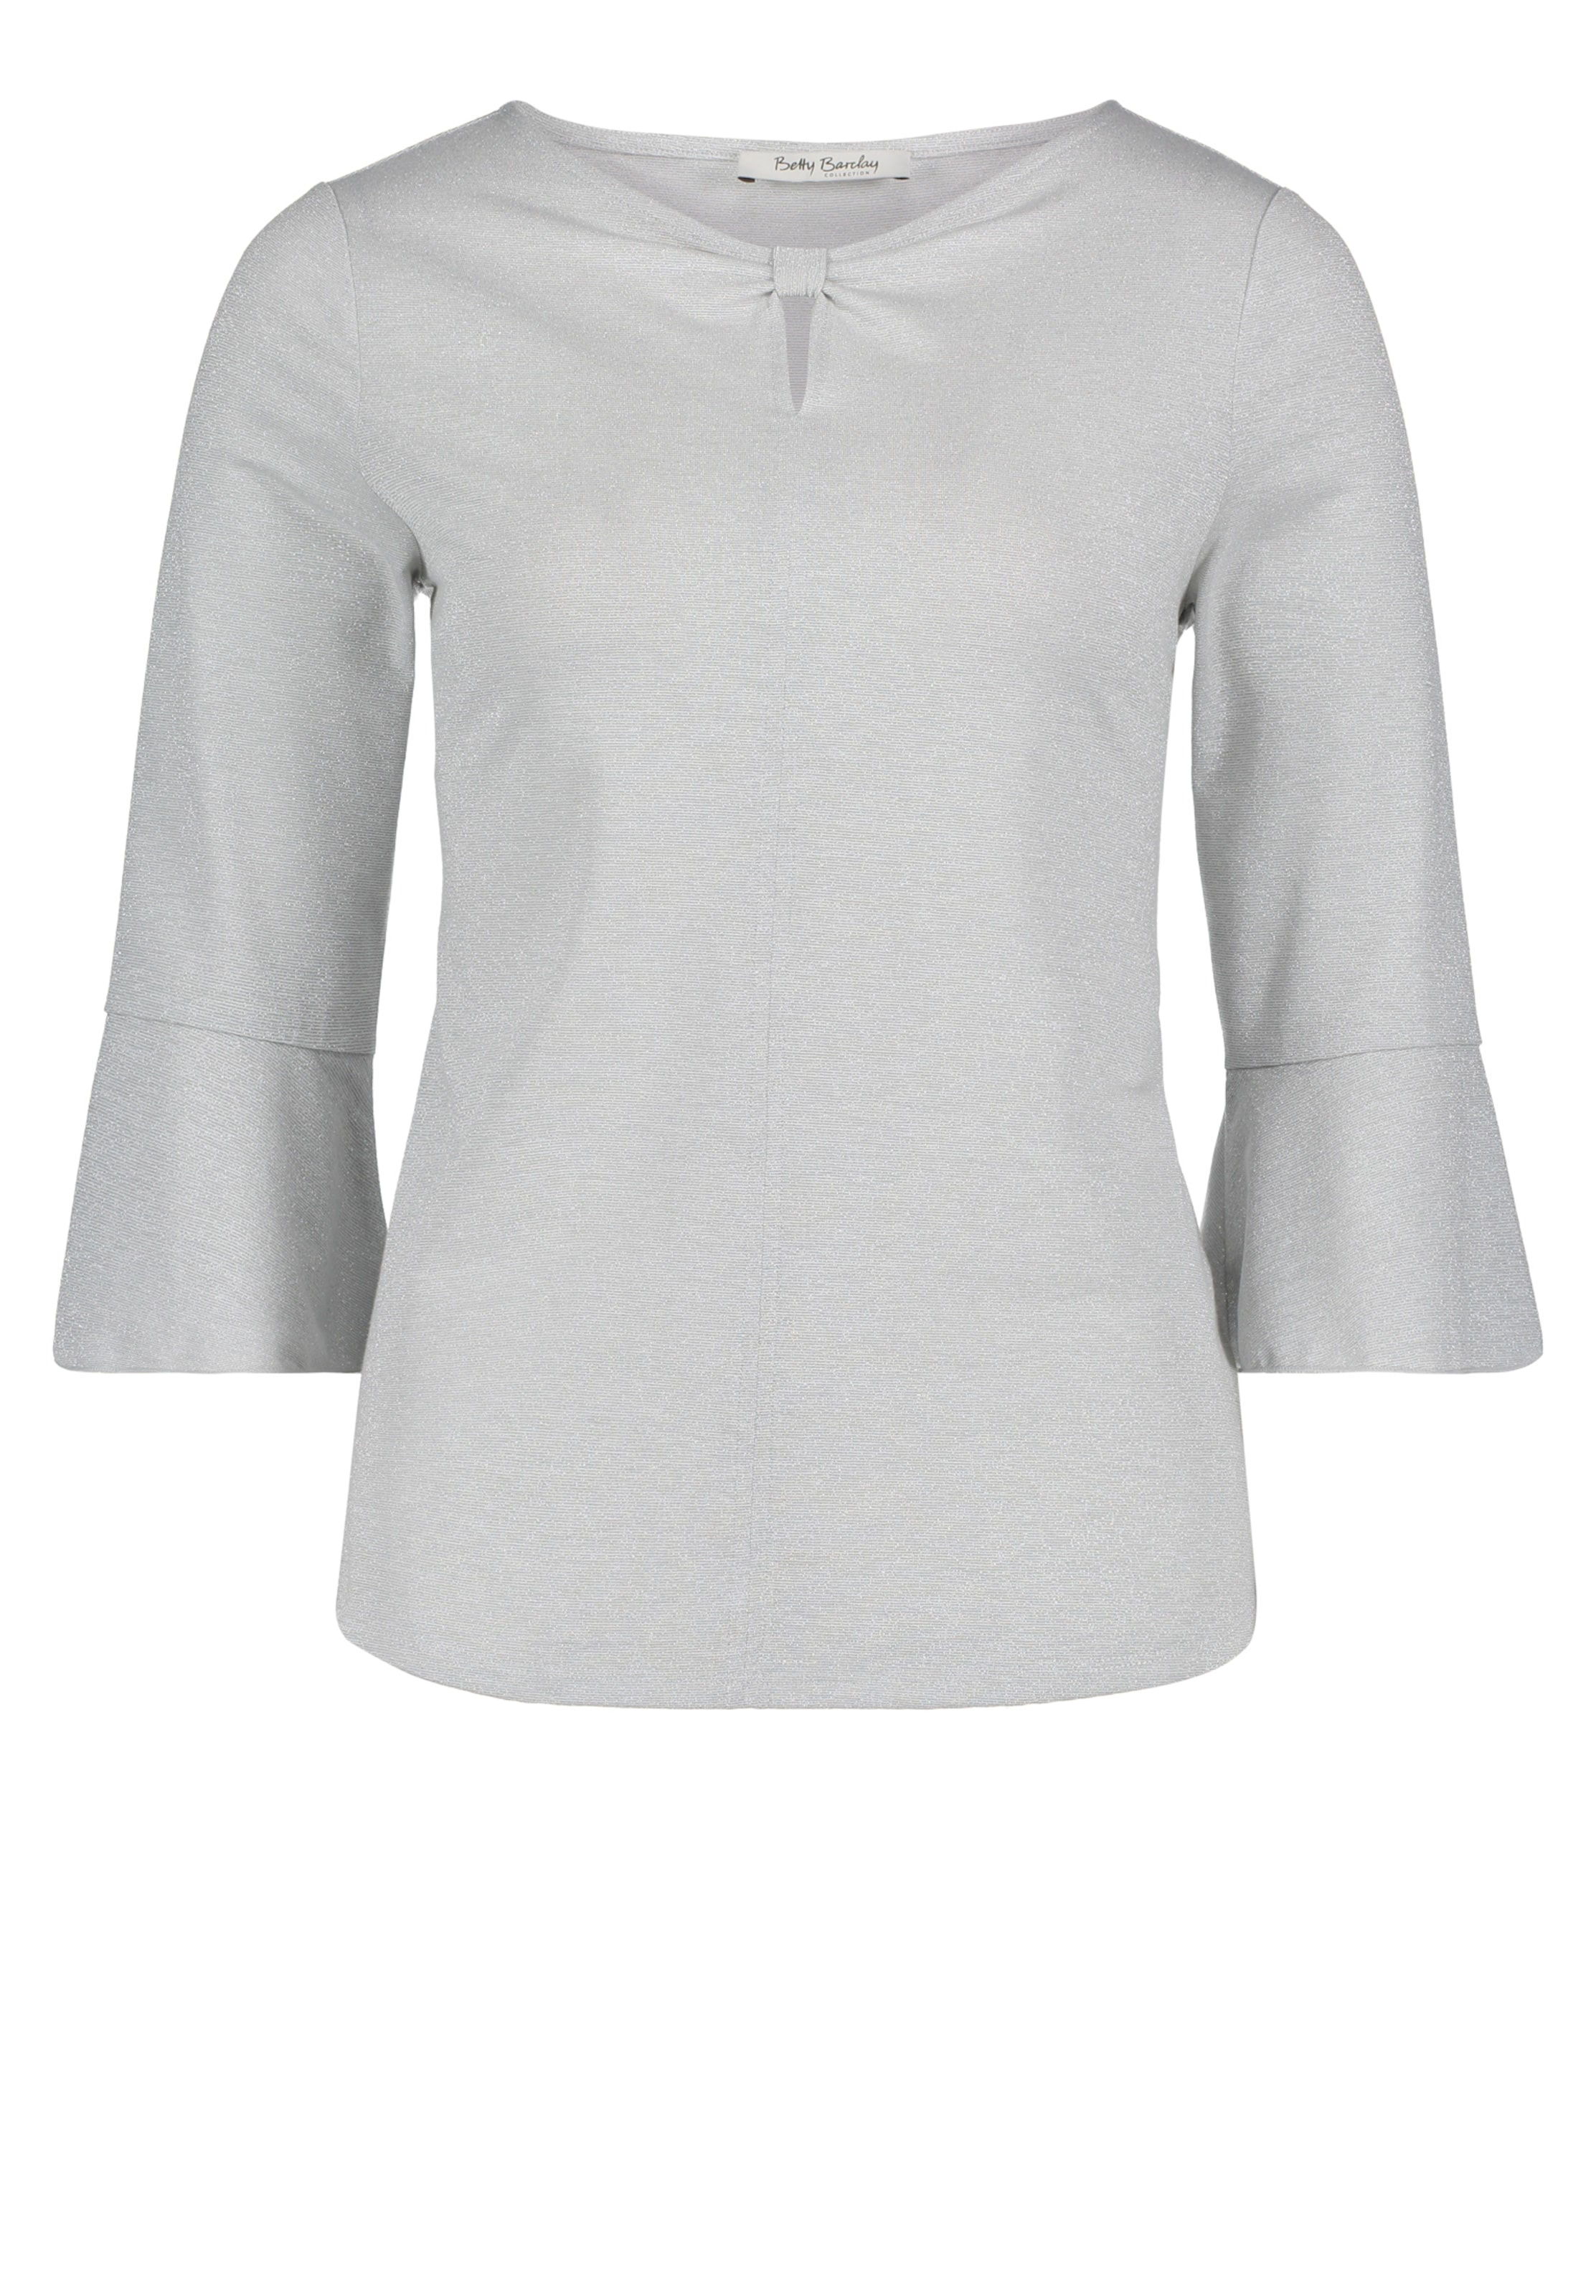 Betty Betty Barclay Barclay Shirt Wit In Shirt T1JlFKcu3